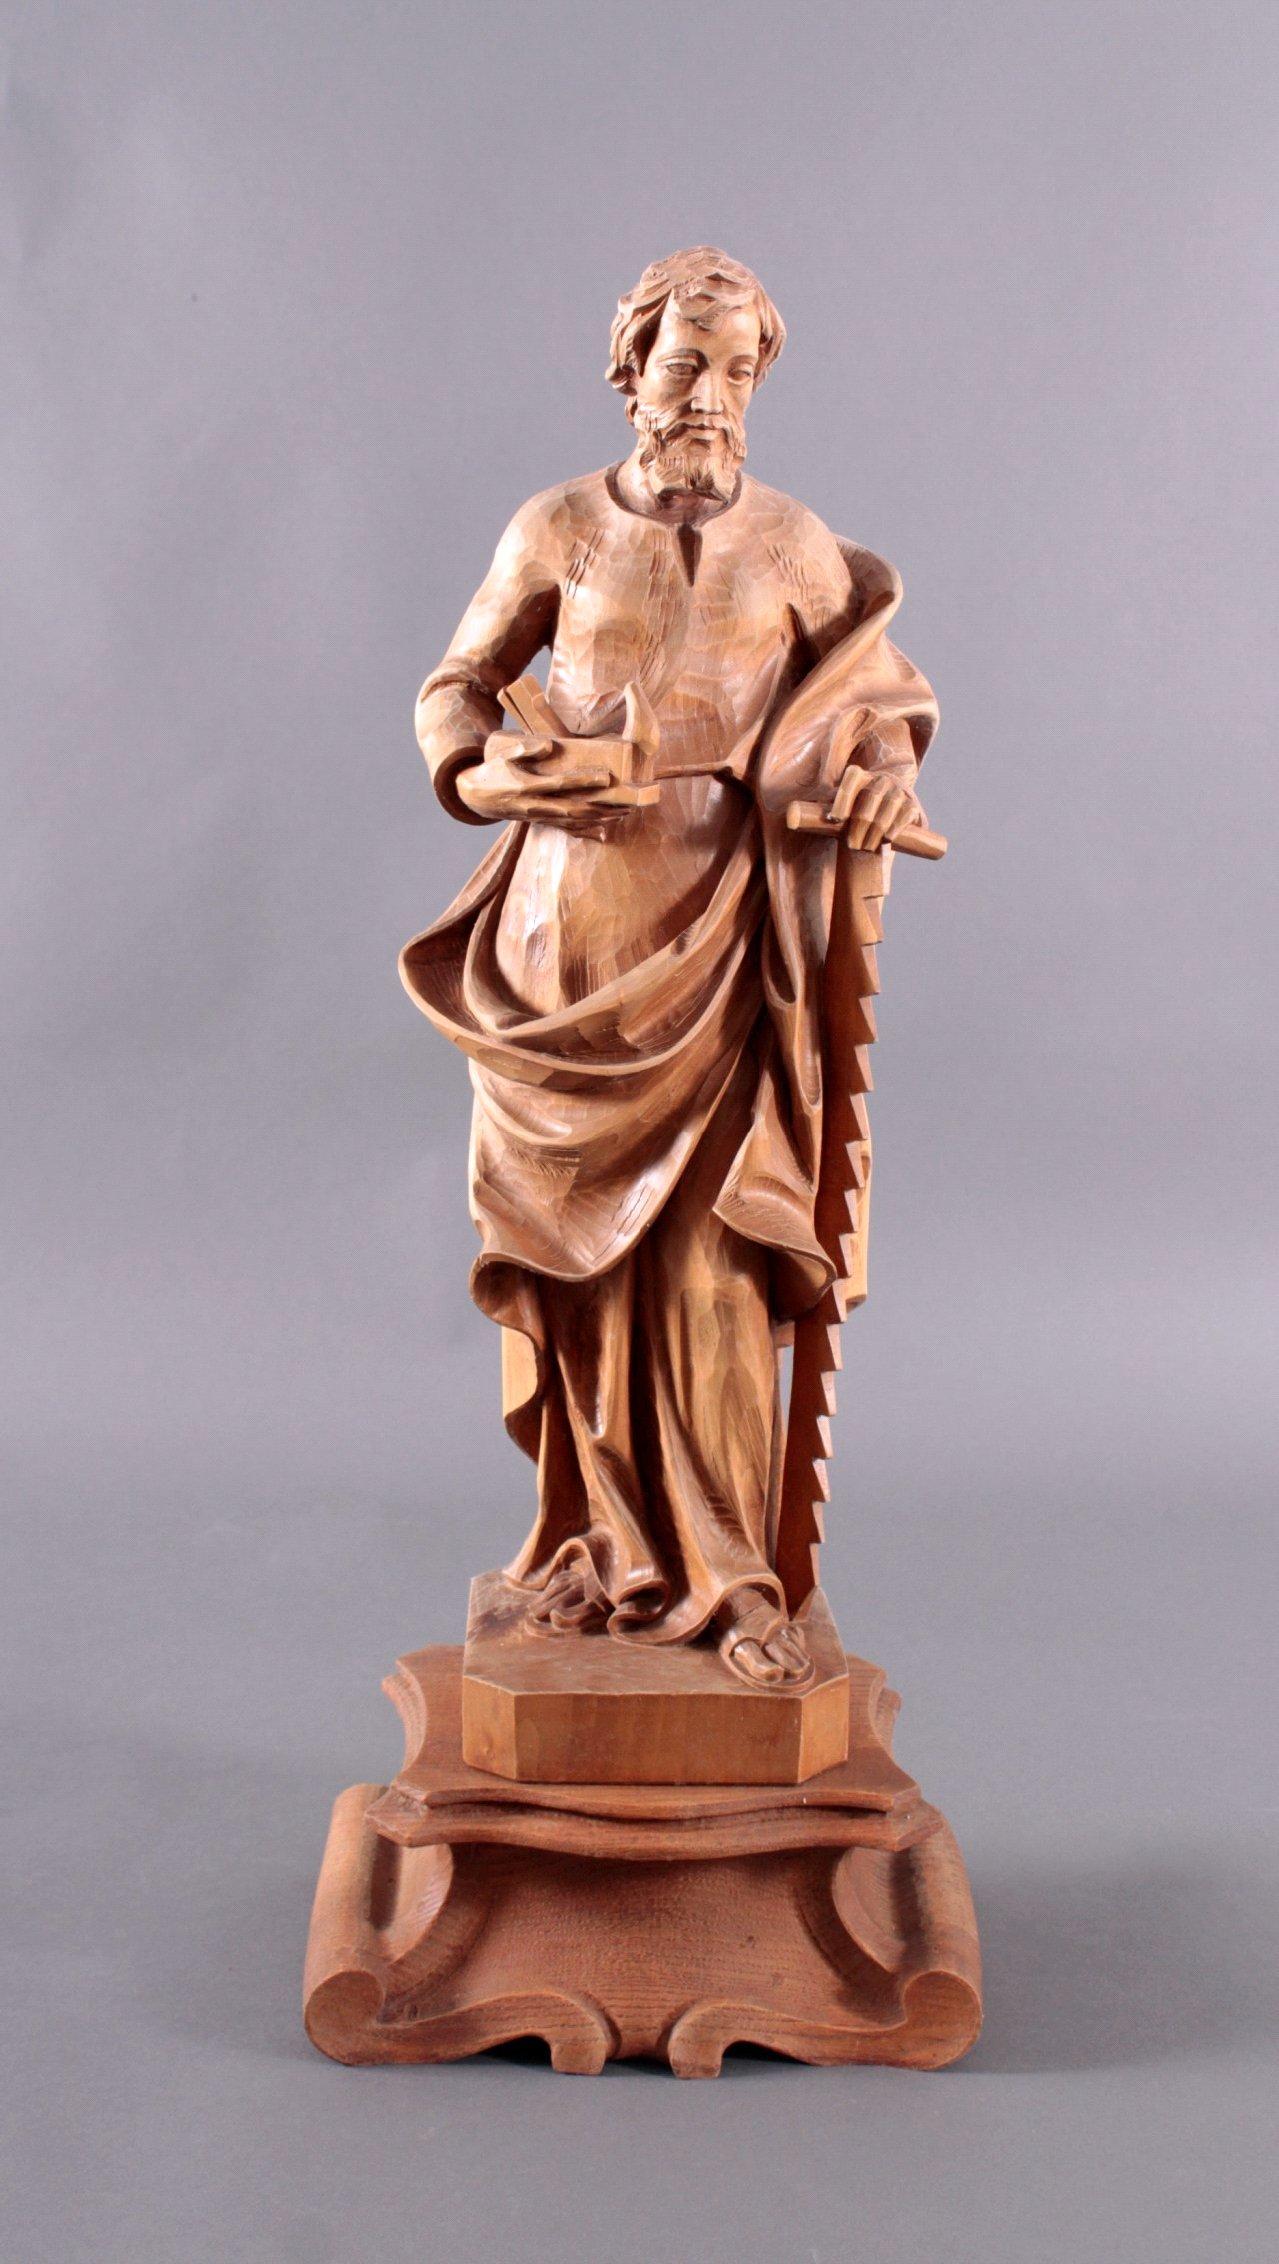 Südtiroler Holzschnitzerei, Der heilige Josef